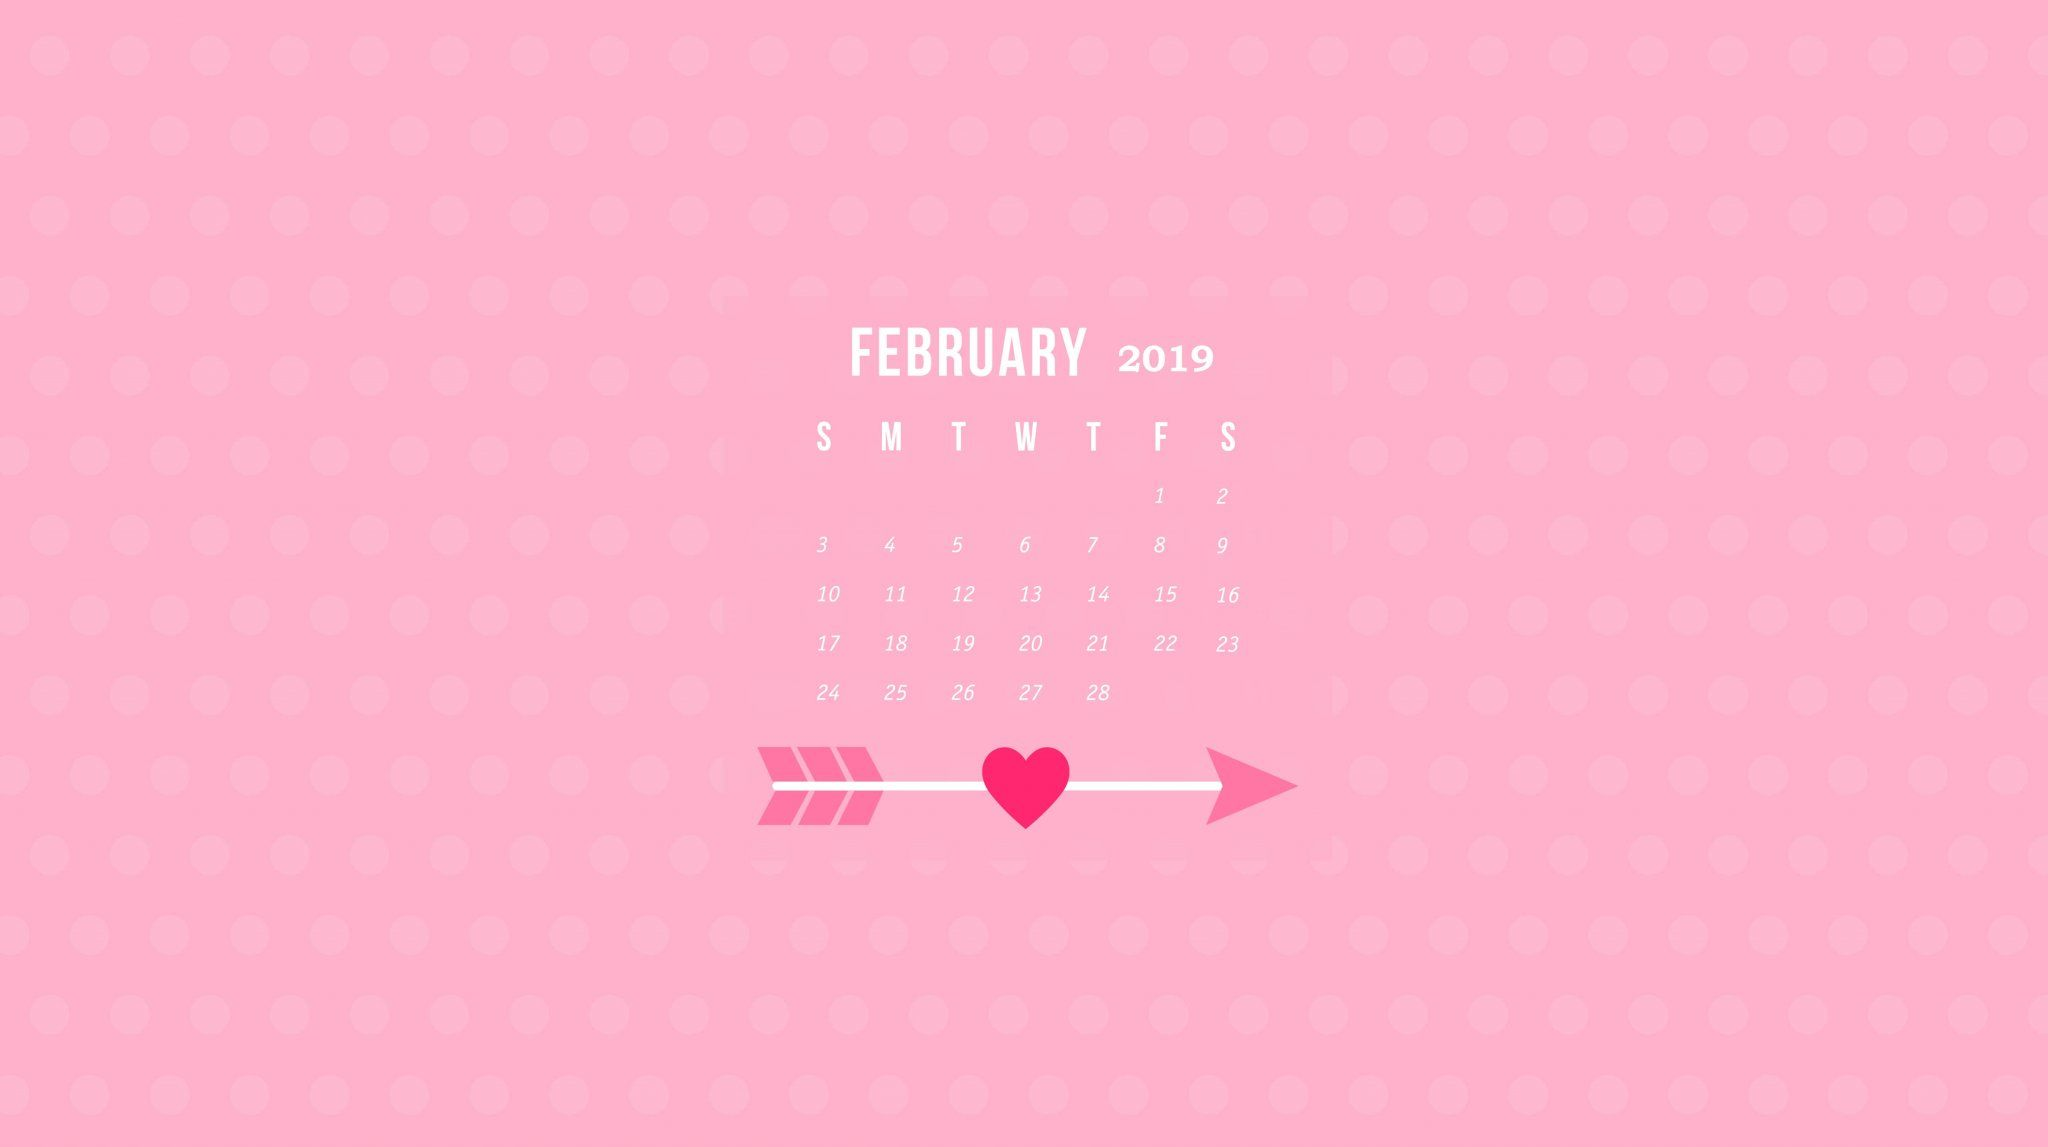 February Wallpaper Calendar 2019 February 2019 Calendar Wallpapers #February2019